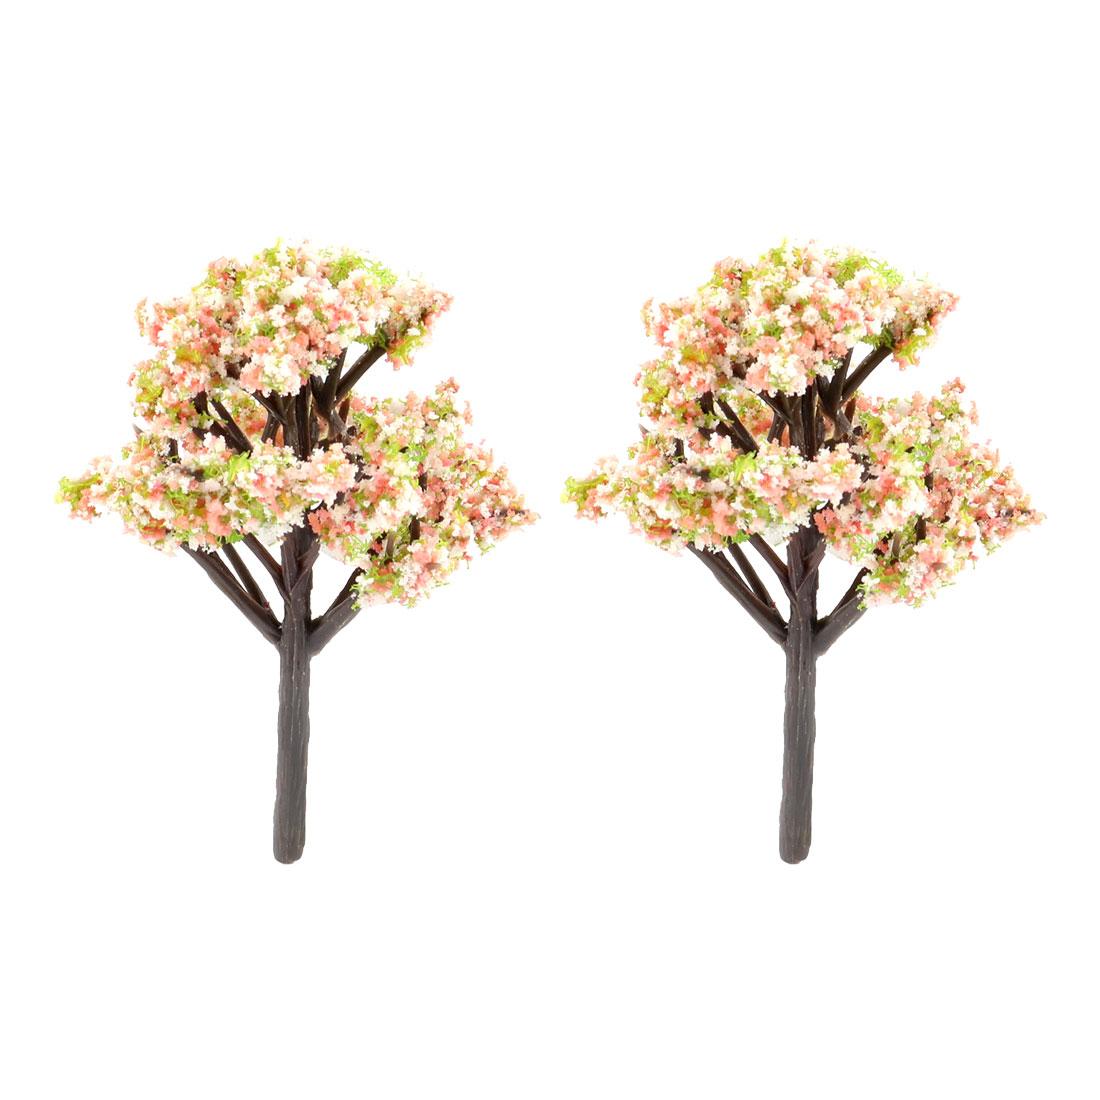 Household Garden Decor Resin Artificial Plant Tree Bonsai Landscape White 2 Pcs